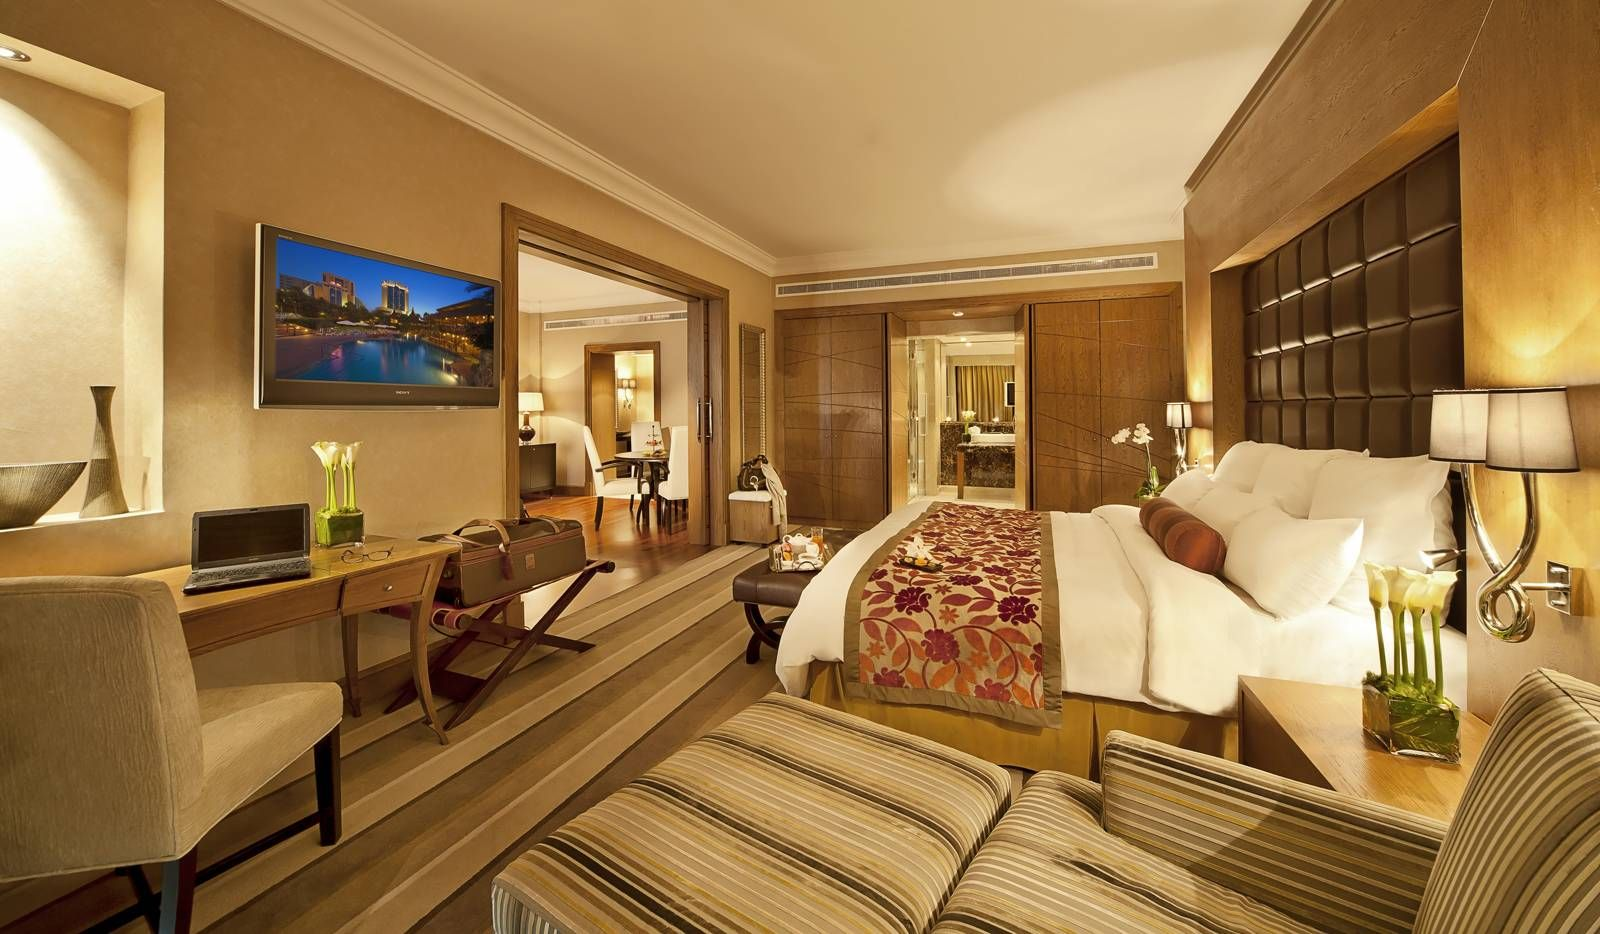 Masters Luxury Bedroom Master Luxury Hotel Room Luxurious Bedrooms